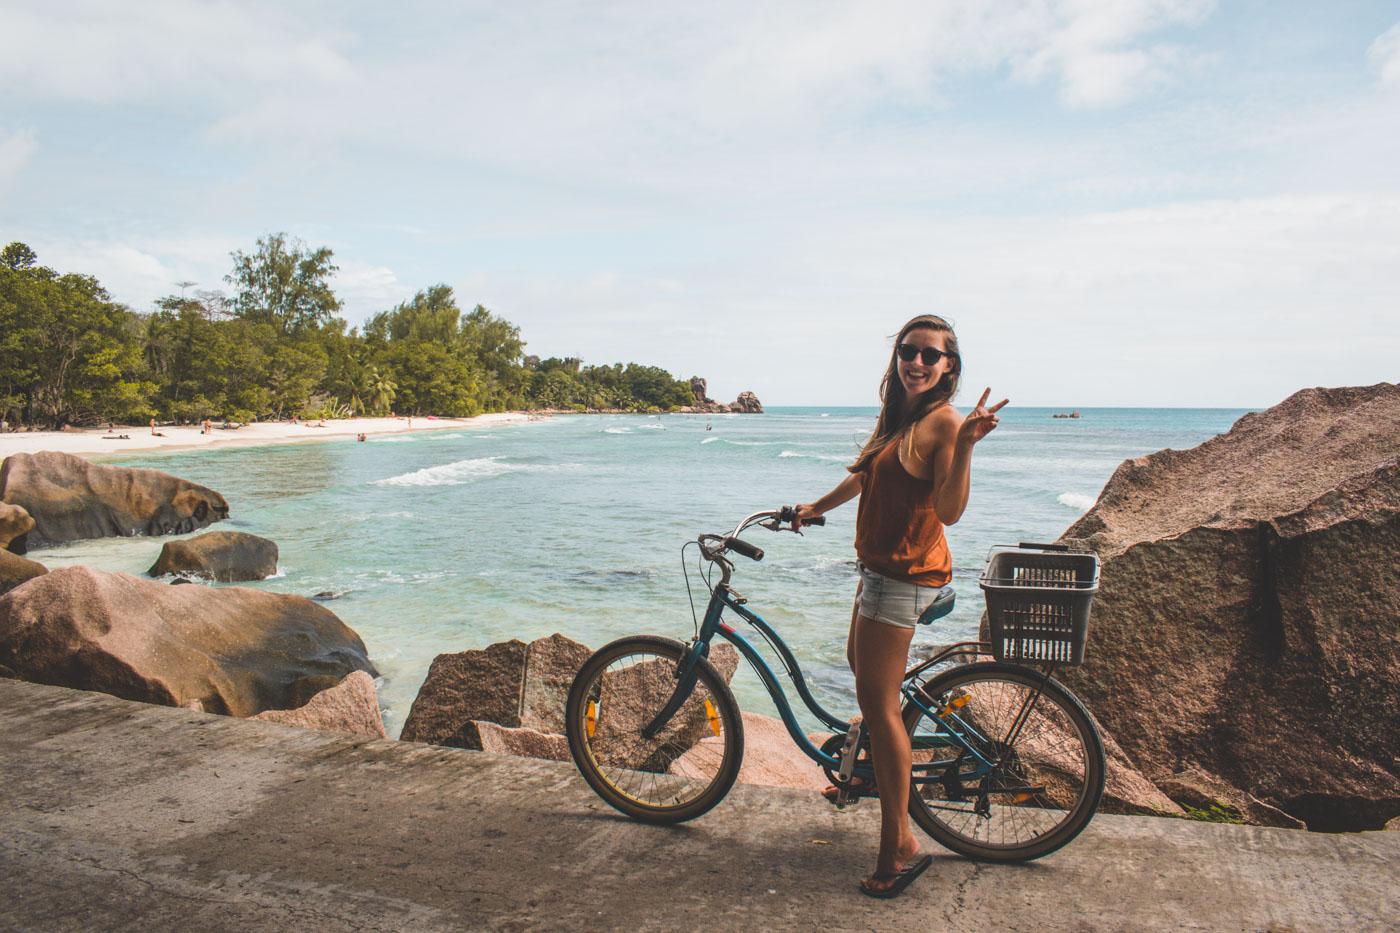 La Digue Seychellen fiets eiland